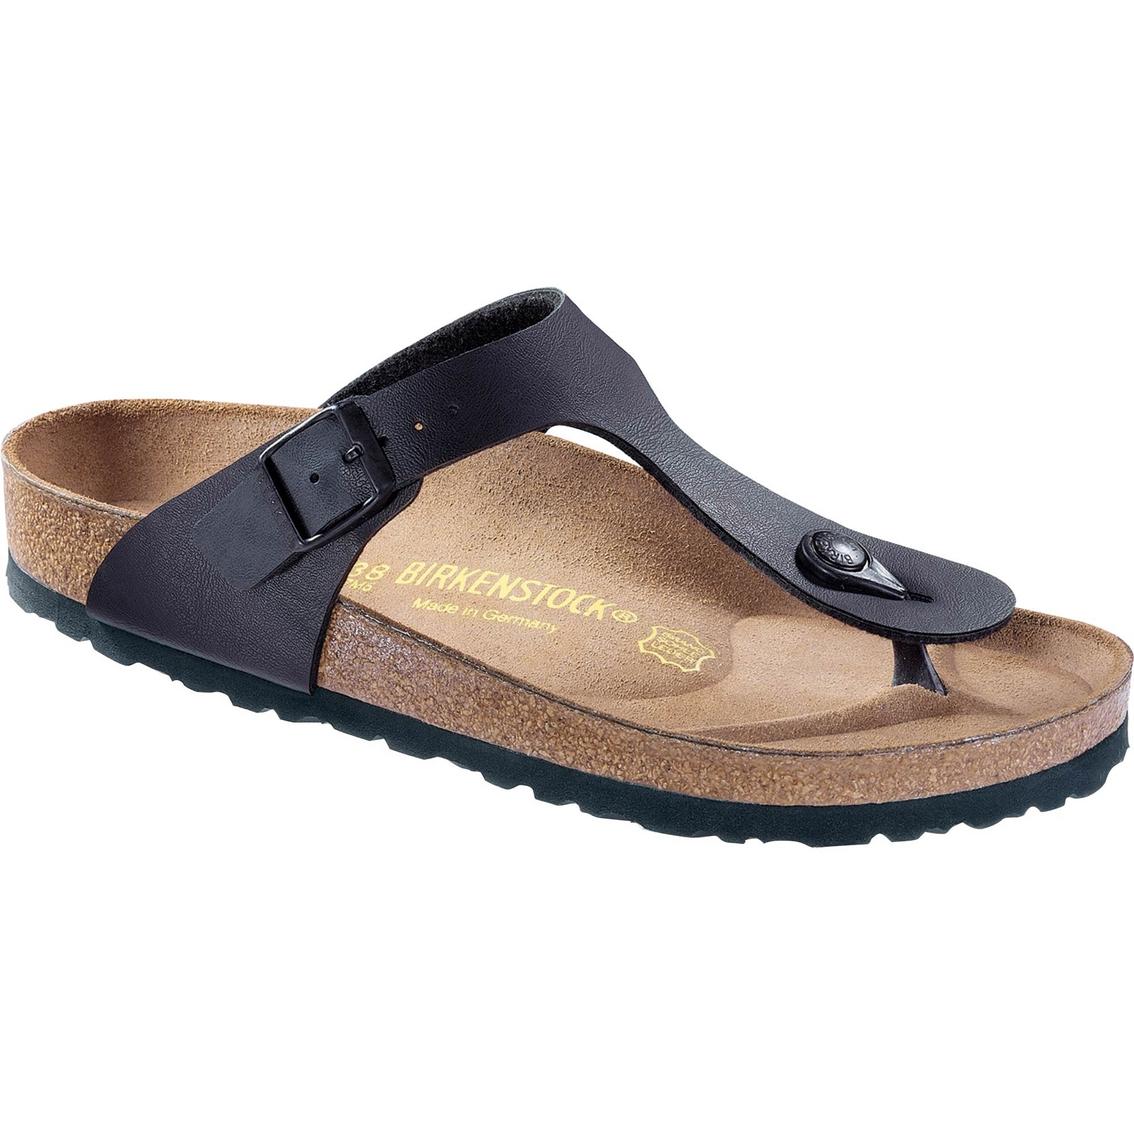 1bb28cb565c4 Birkenstock Women s Gizeh Sandals